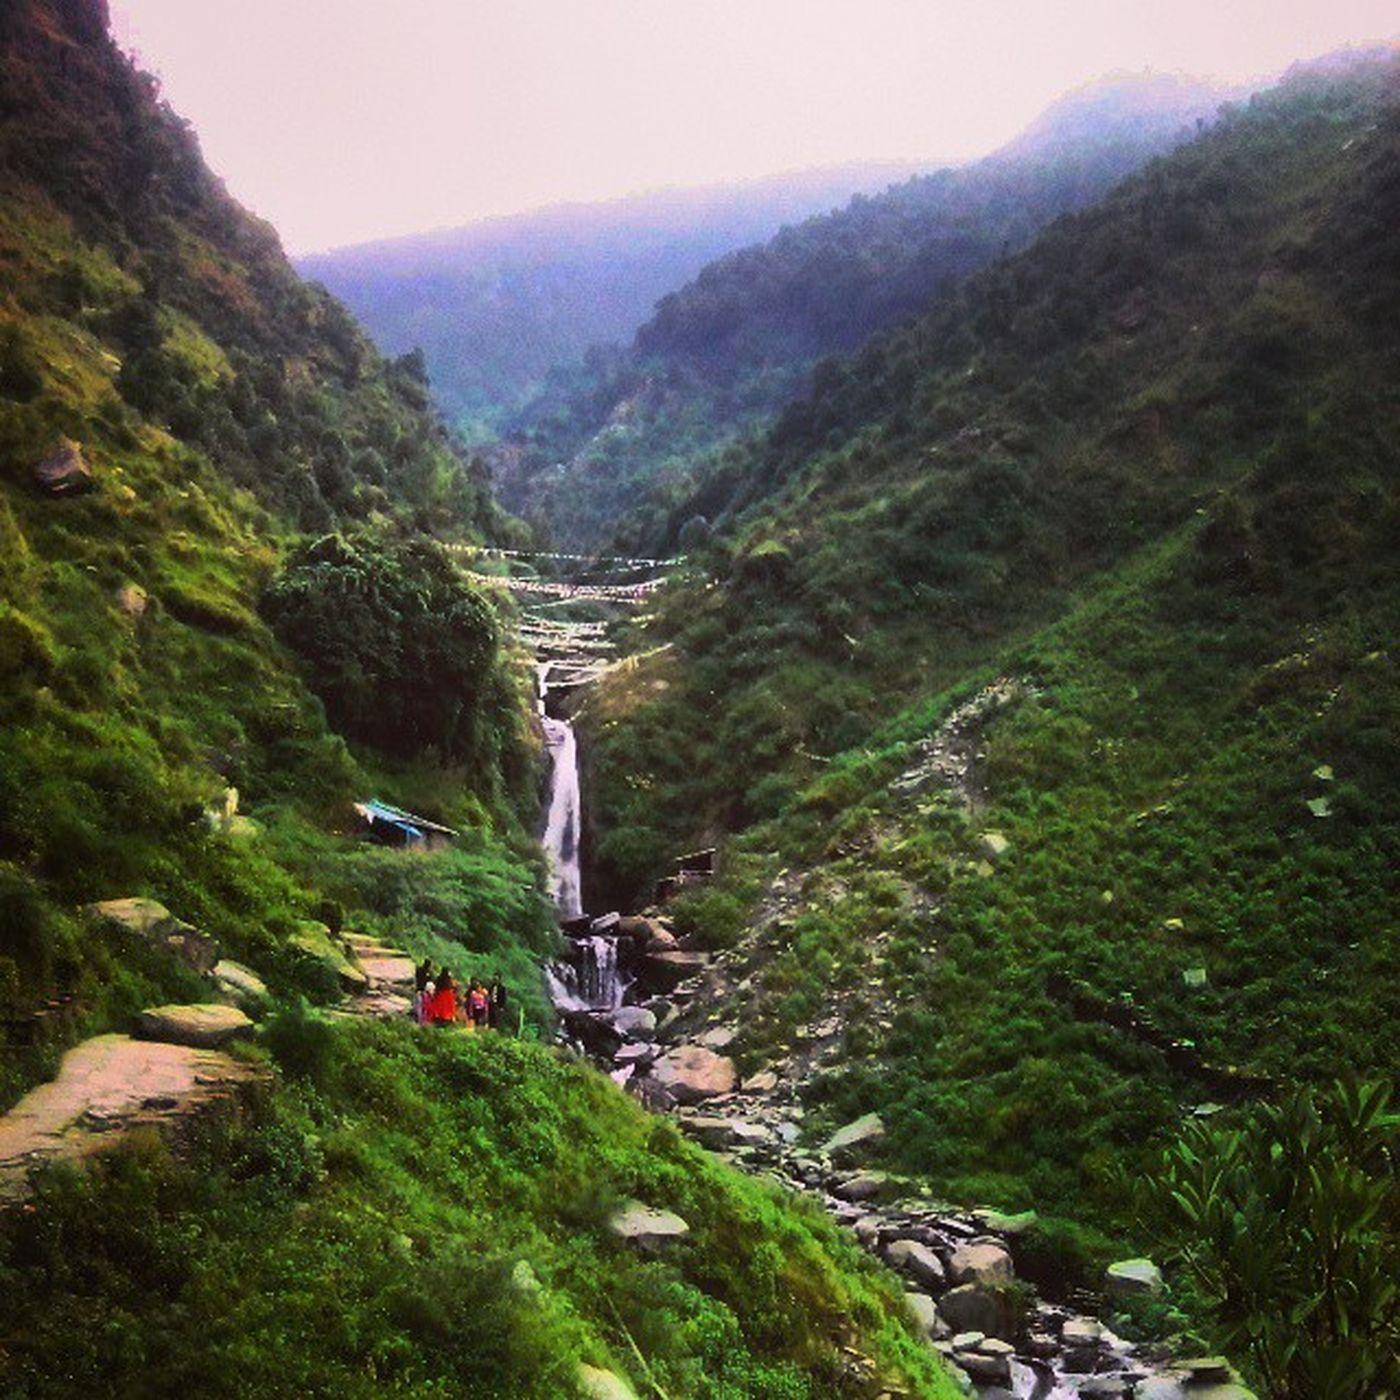 Bhagsunag Waterfall Amazing View nature beauty paradise landscape mcleodganj dharmshala himachal incredibleindia colourofindia instaindia